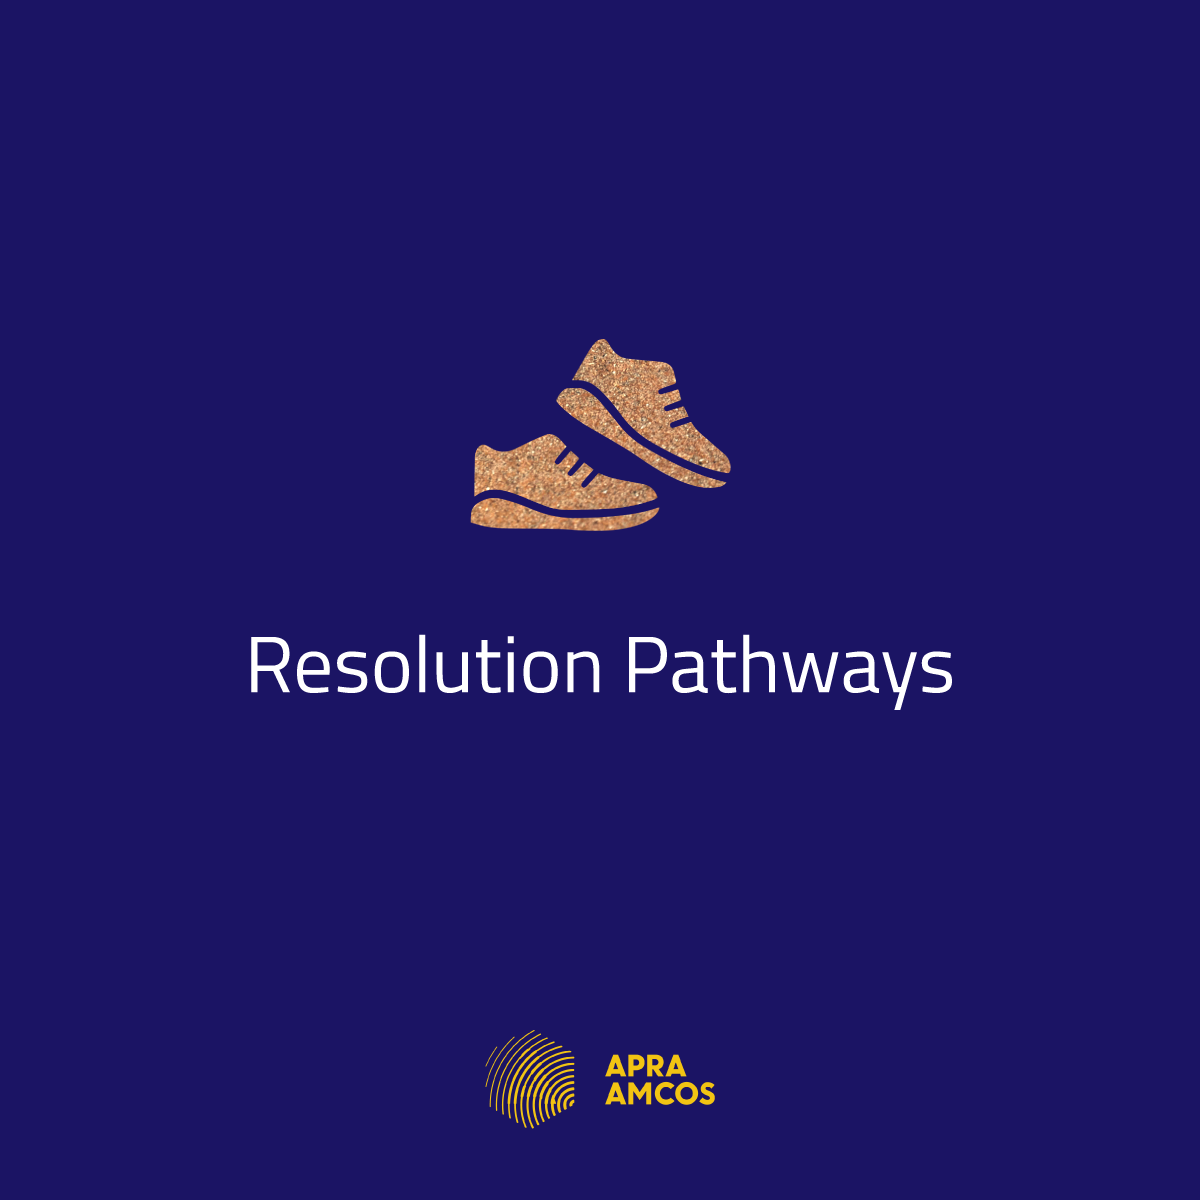 resolution-pathways-codacora-project